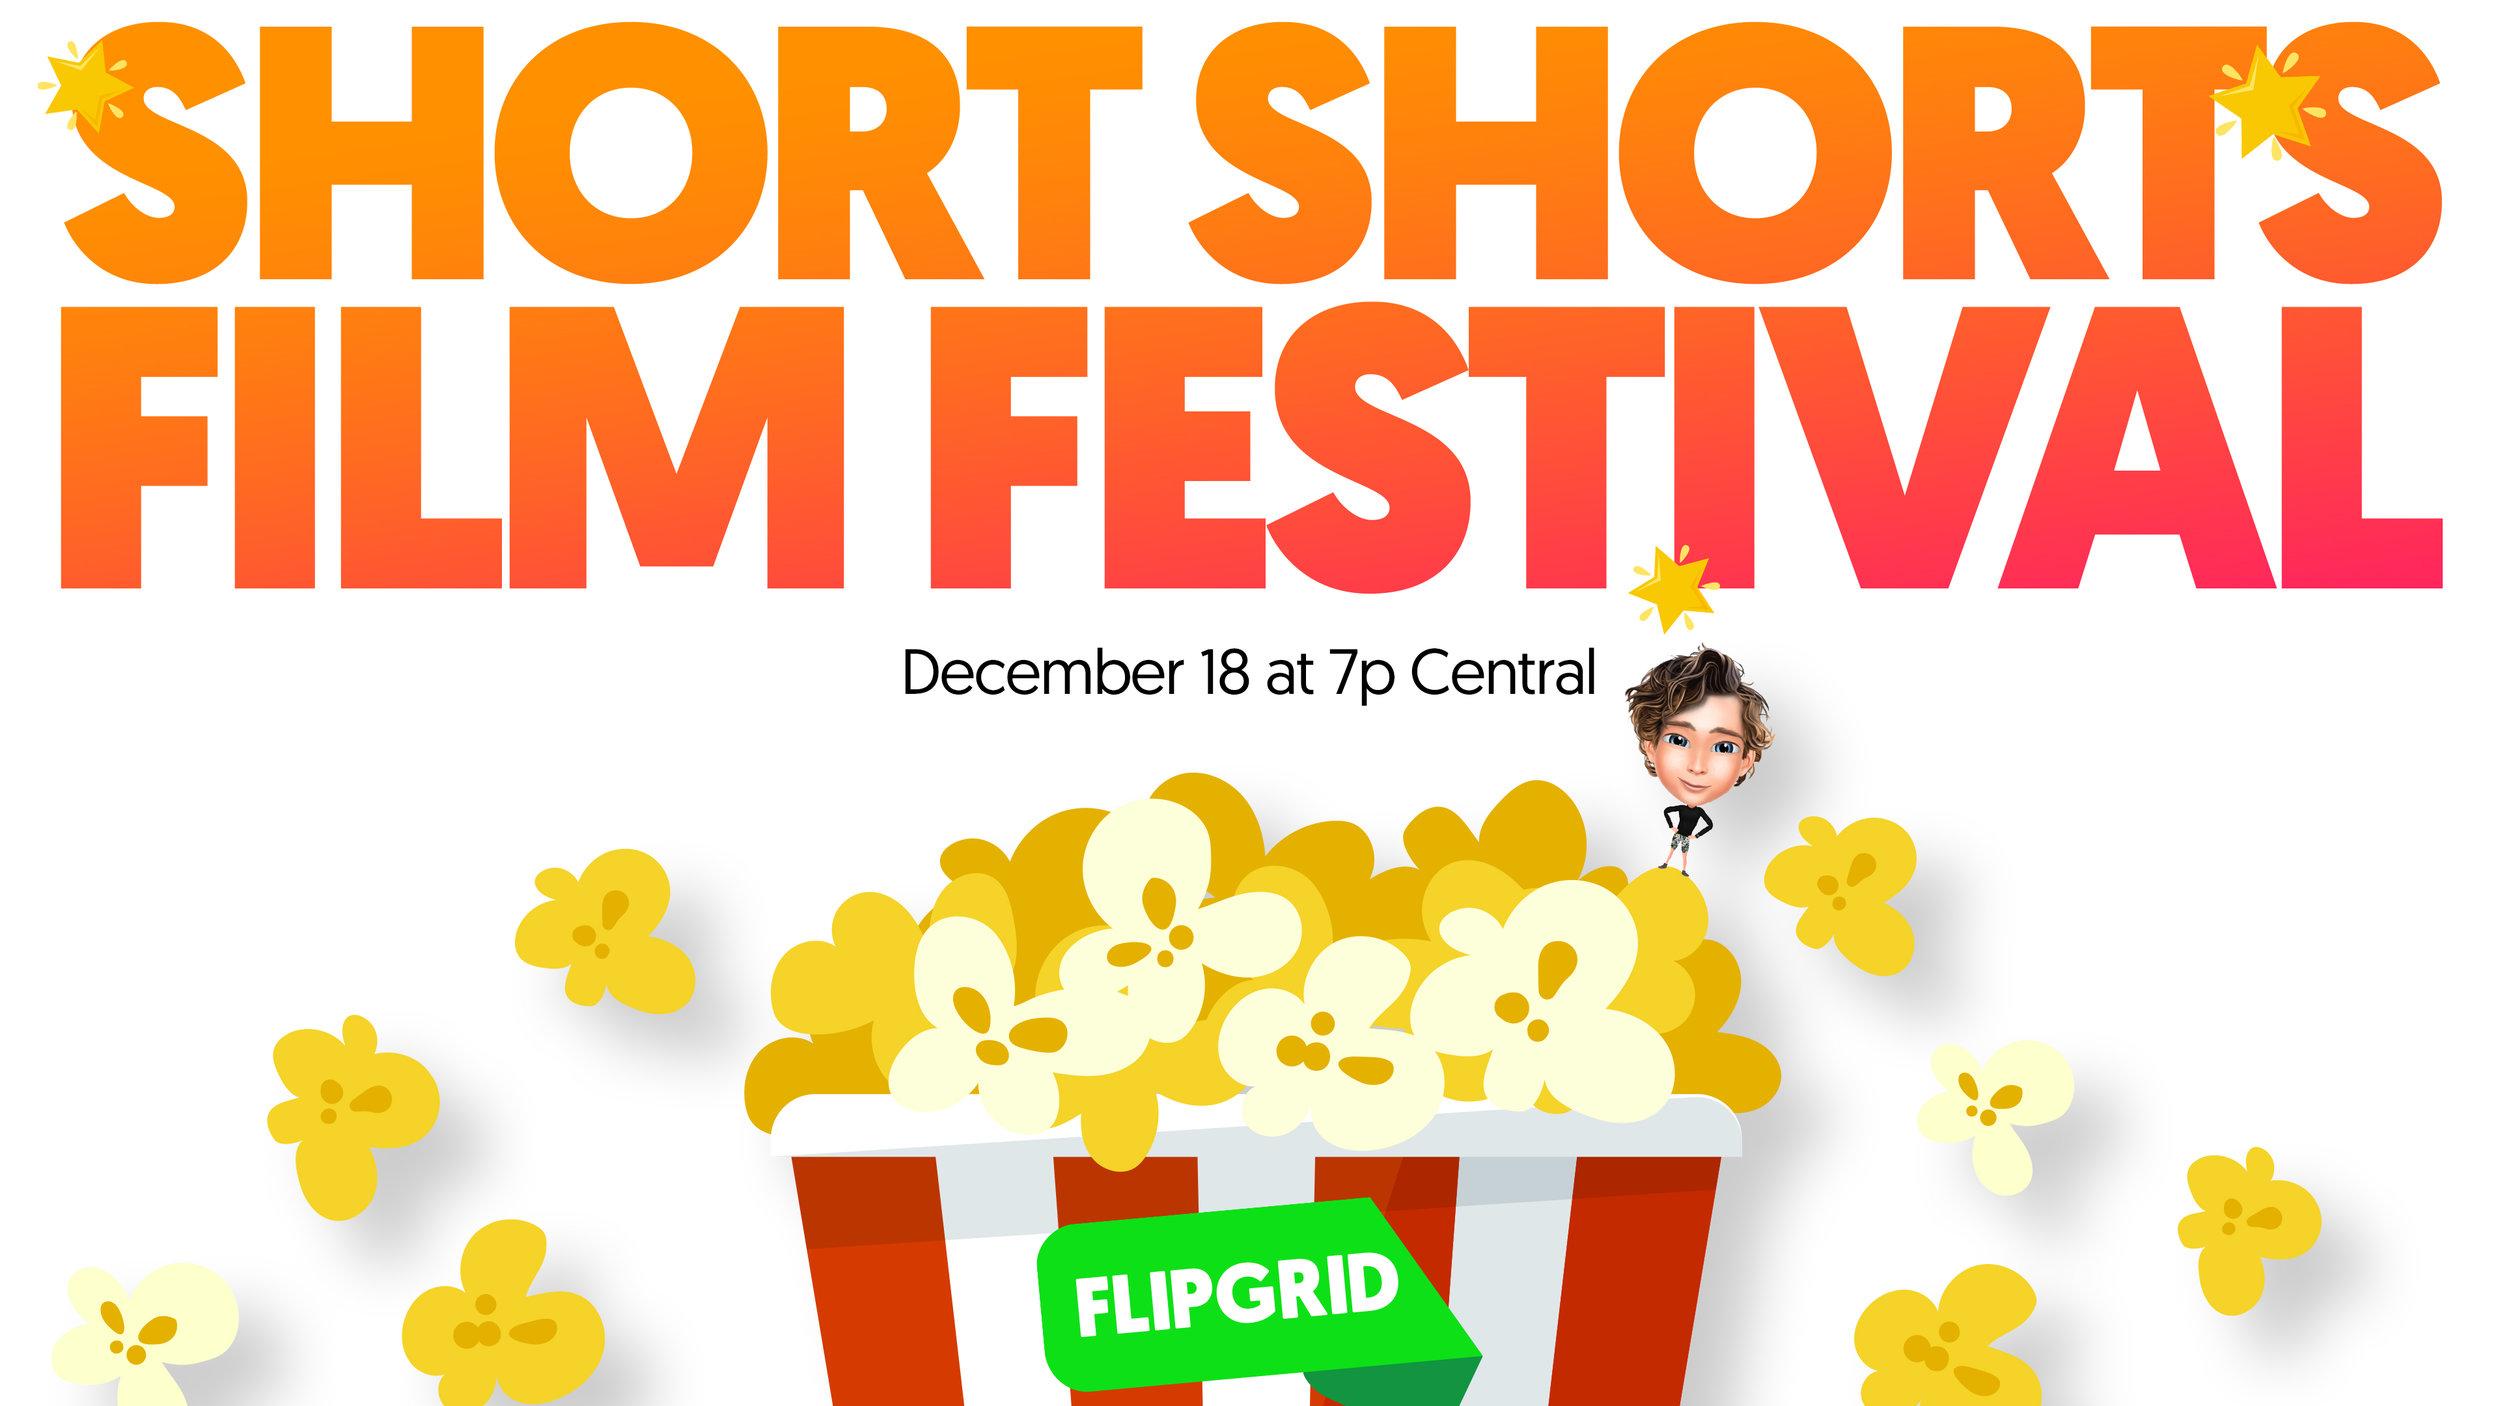 ShortShortsFilmFestival_FlipgridFeature_18December2018_WithShorts.jpg